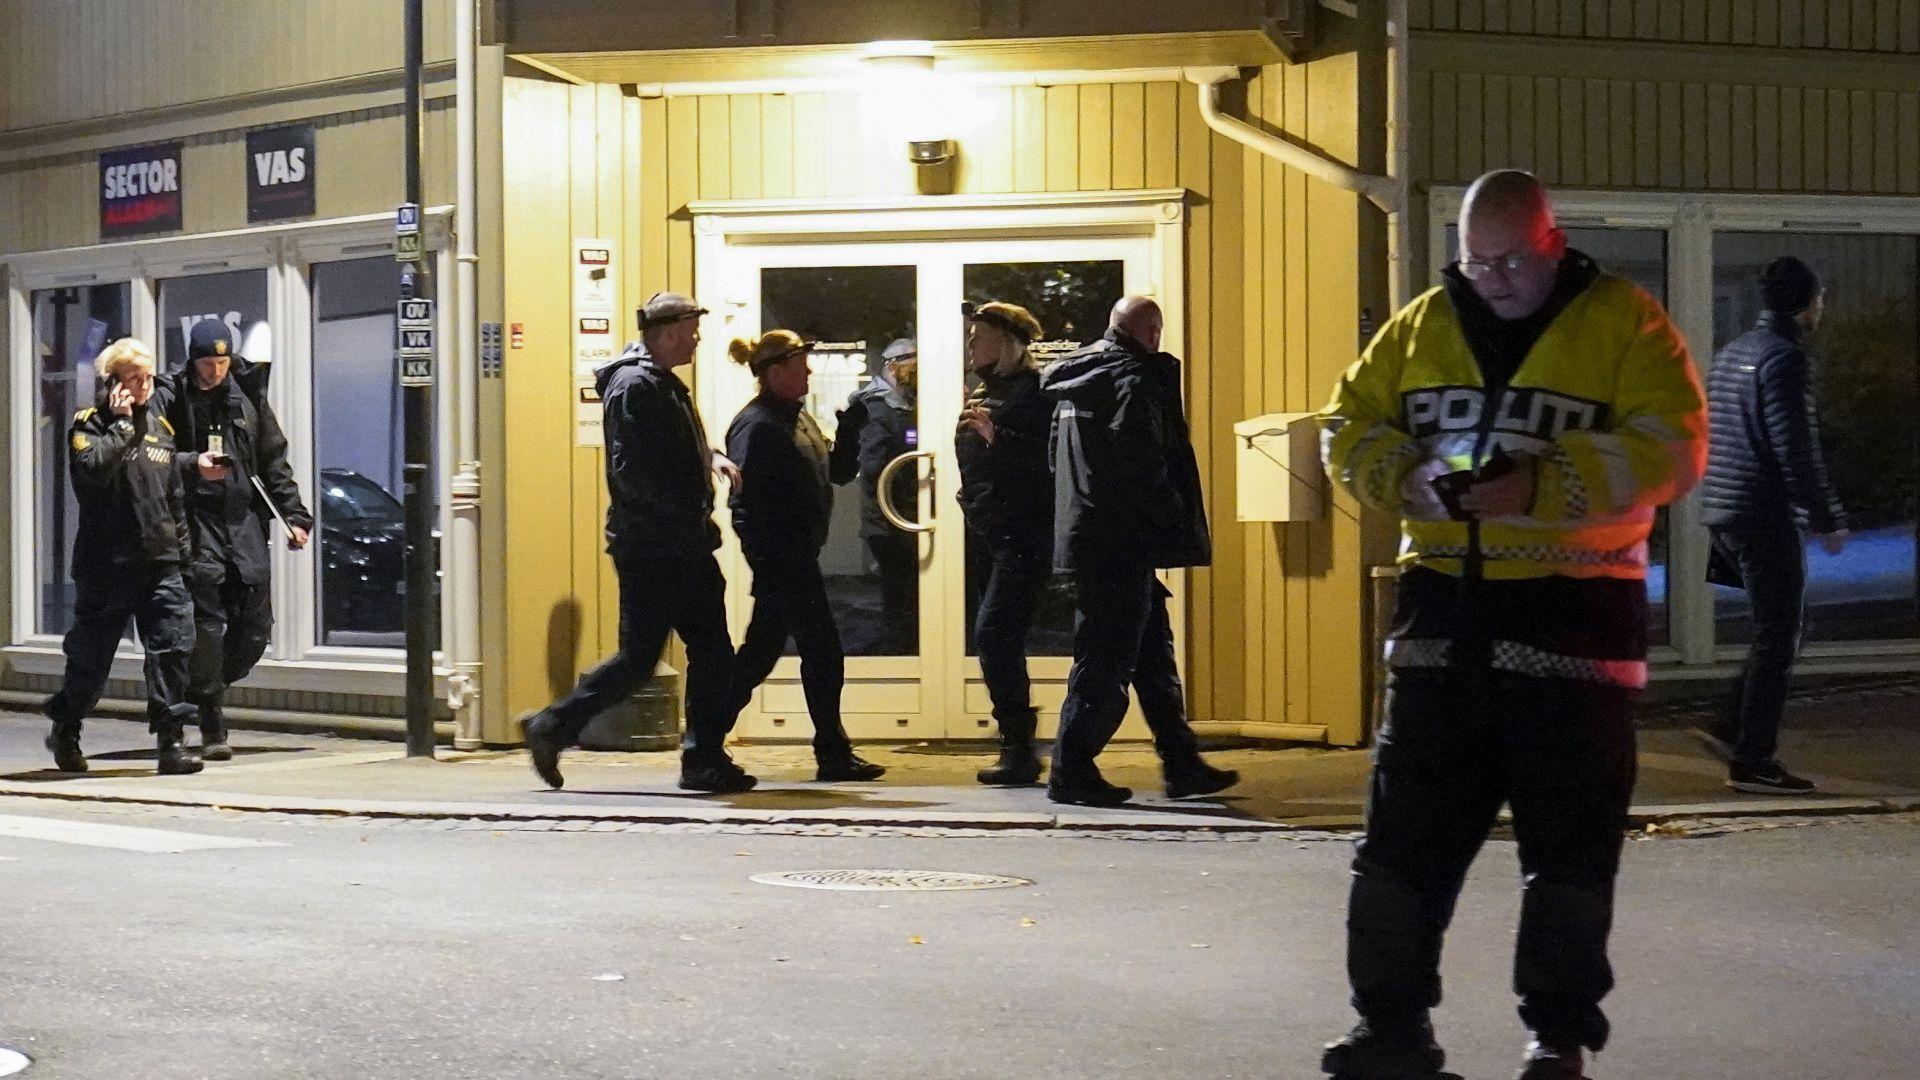 37-годишен датчанин е стрелецът, убил петима души край Осло